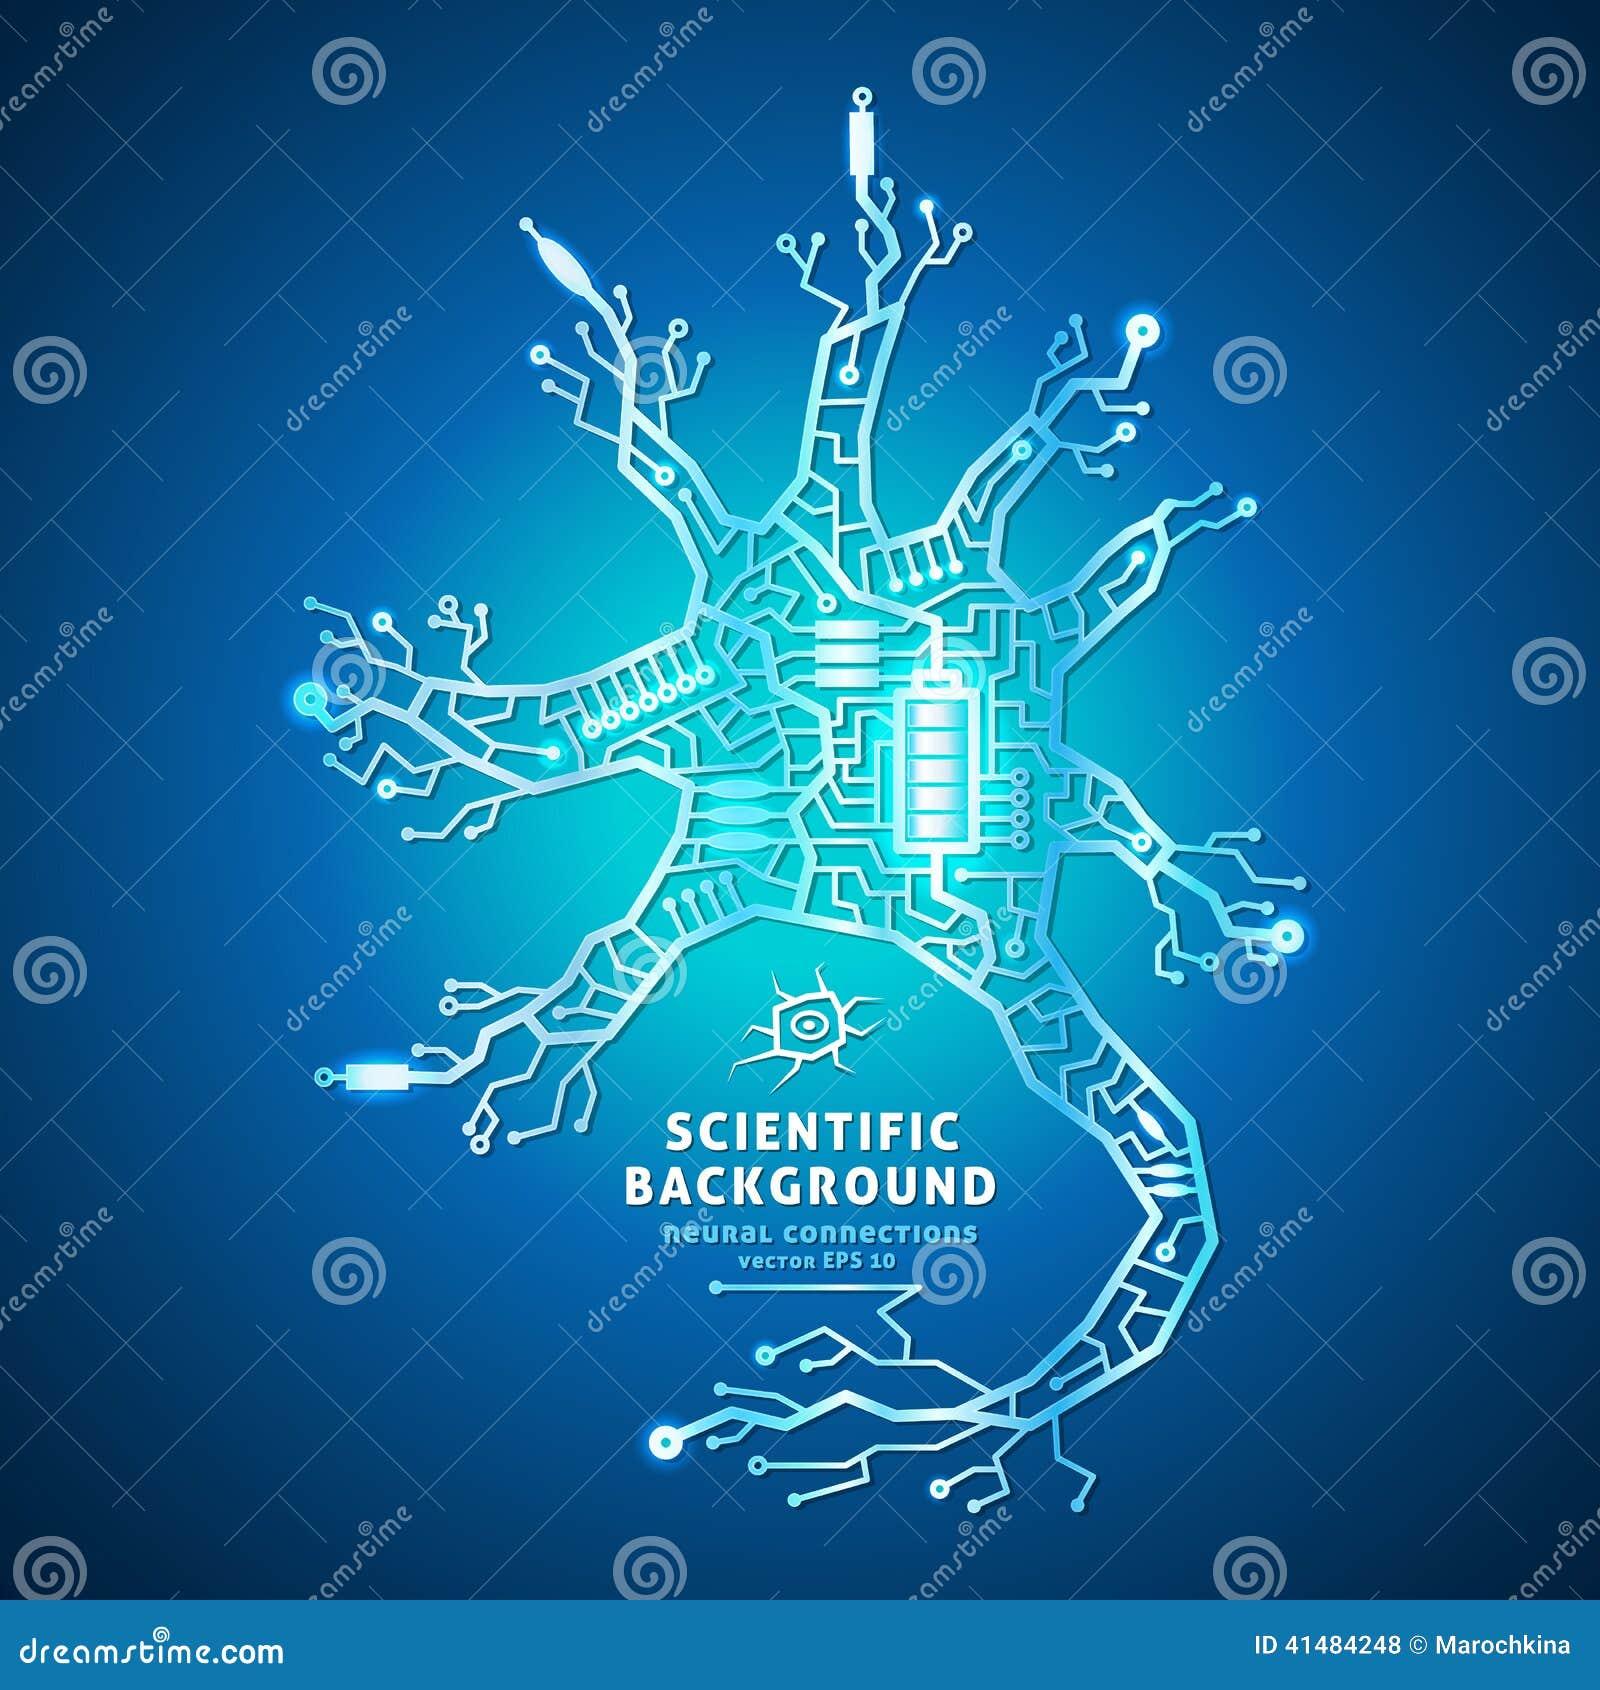 Neuron As An Electrical Circuit Stock Vector Illustration Of Design